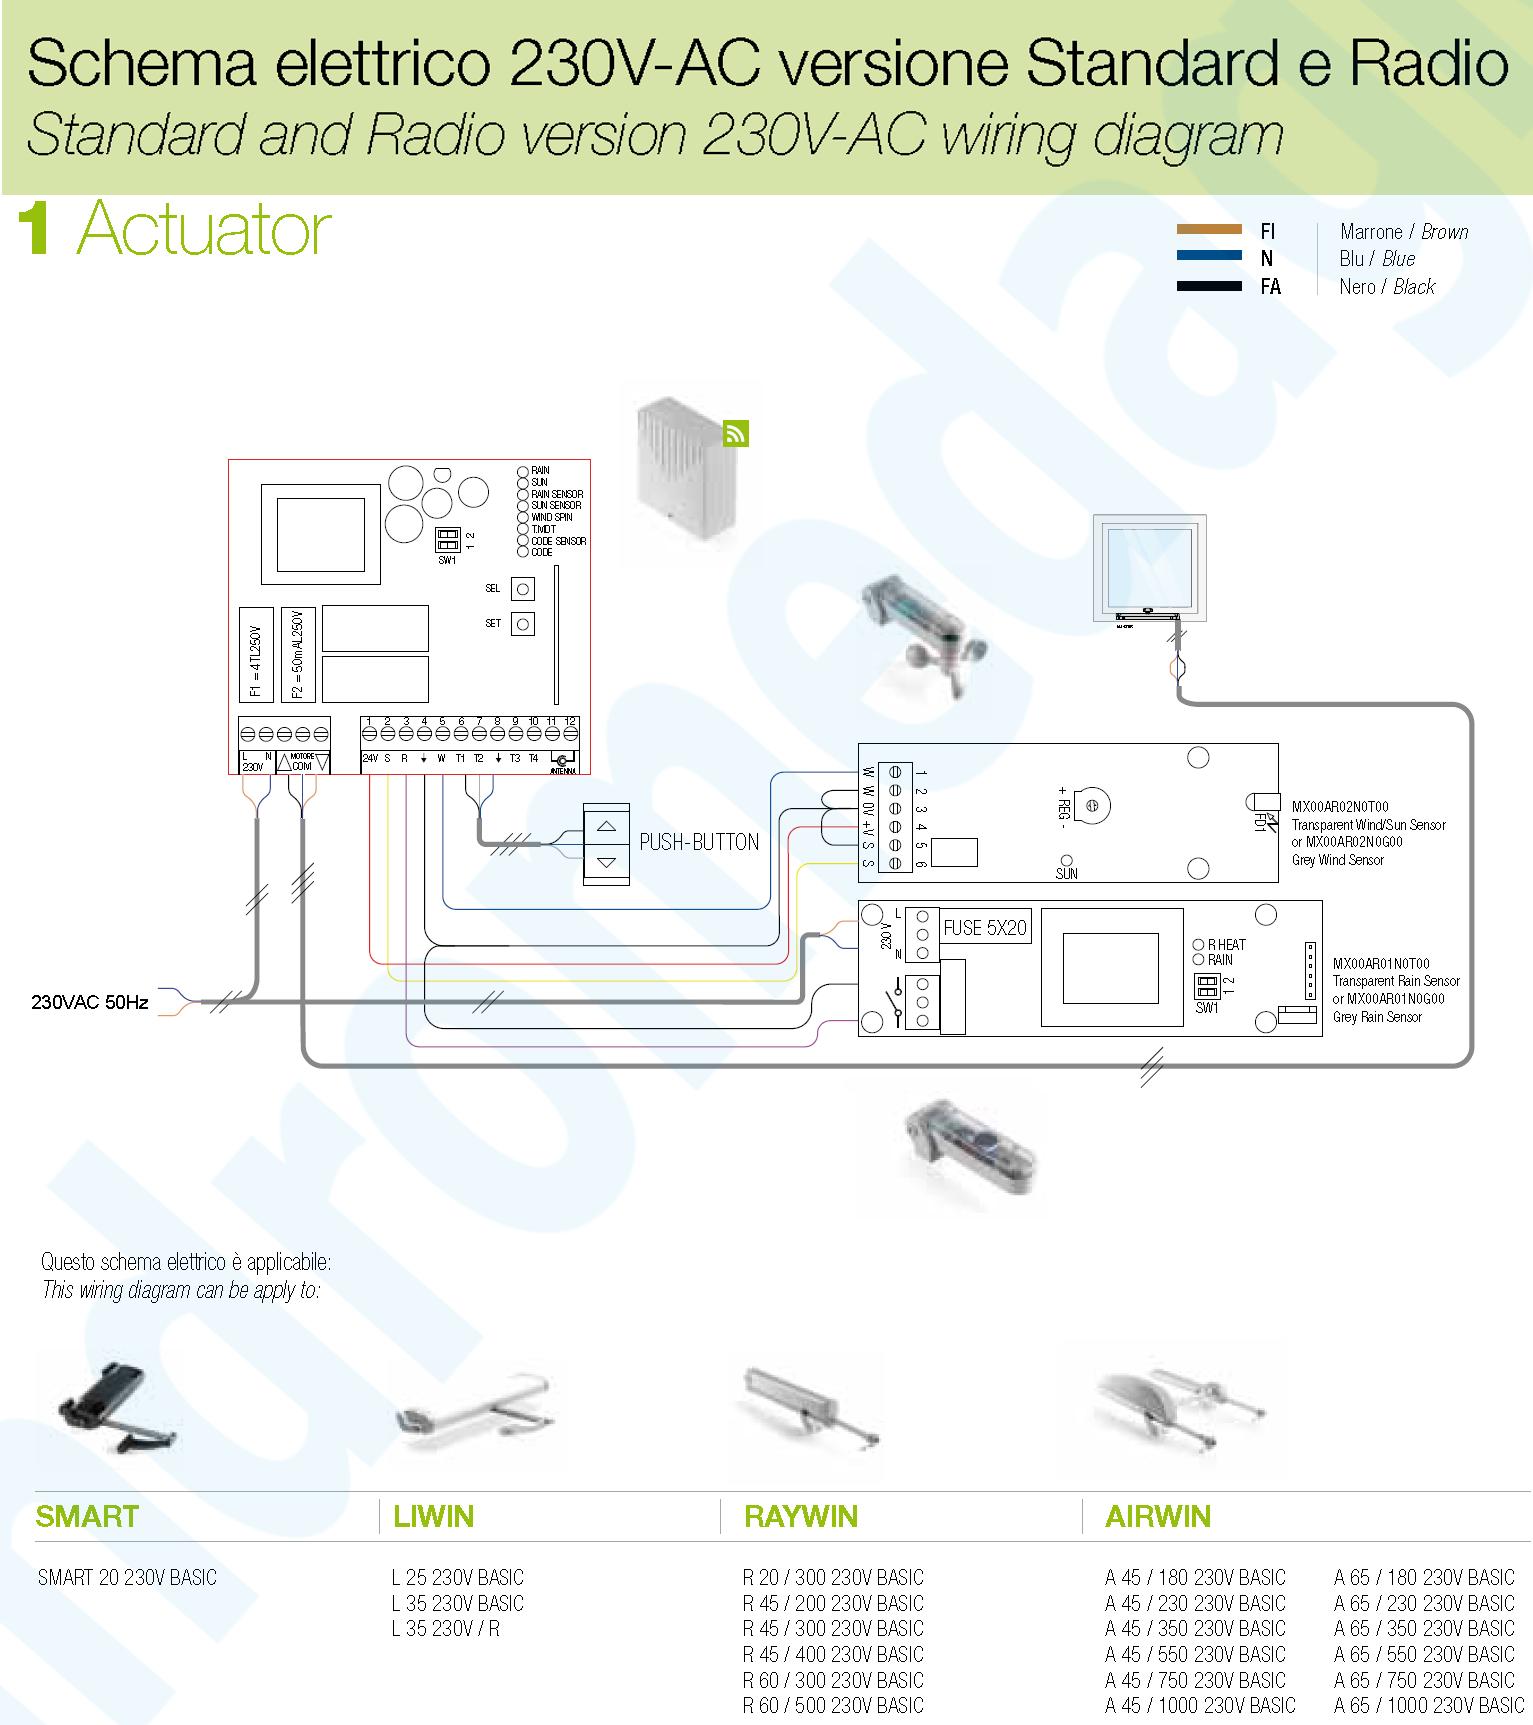 Schema Elettrico Max 250 : Control unit 230v integrated radio home automation systems mowin